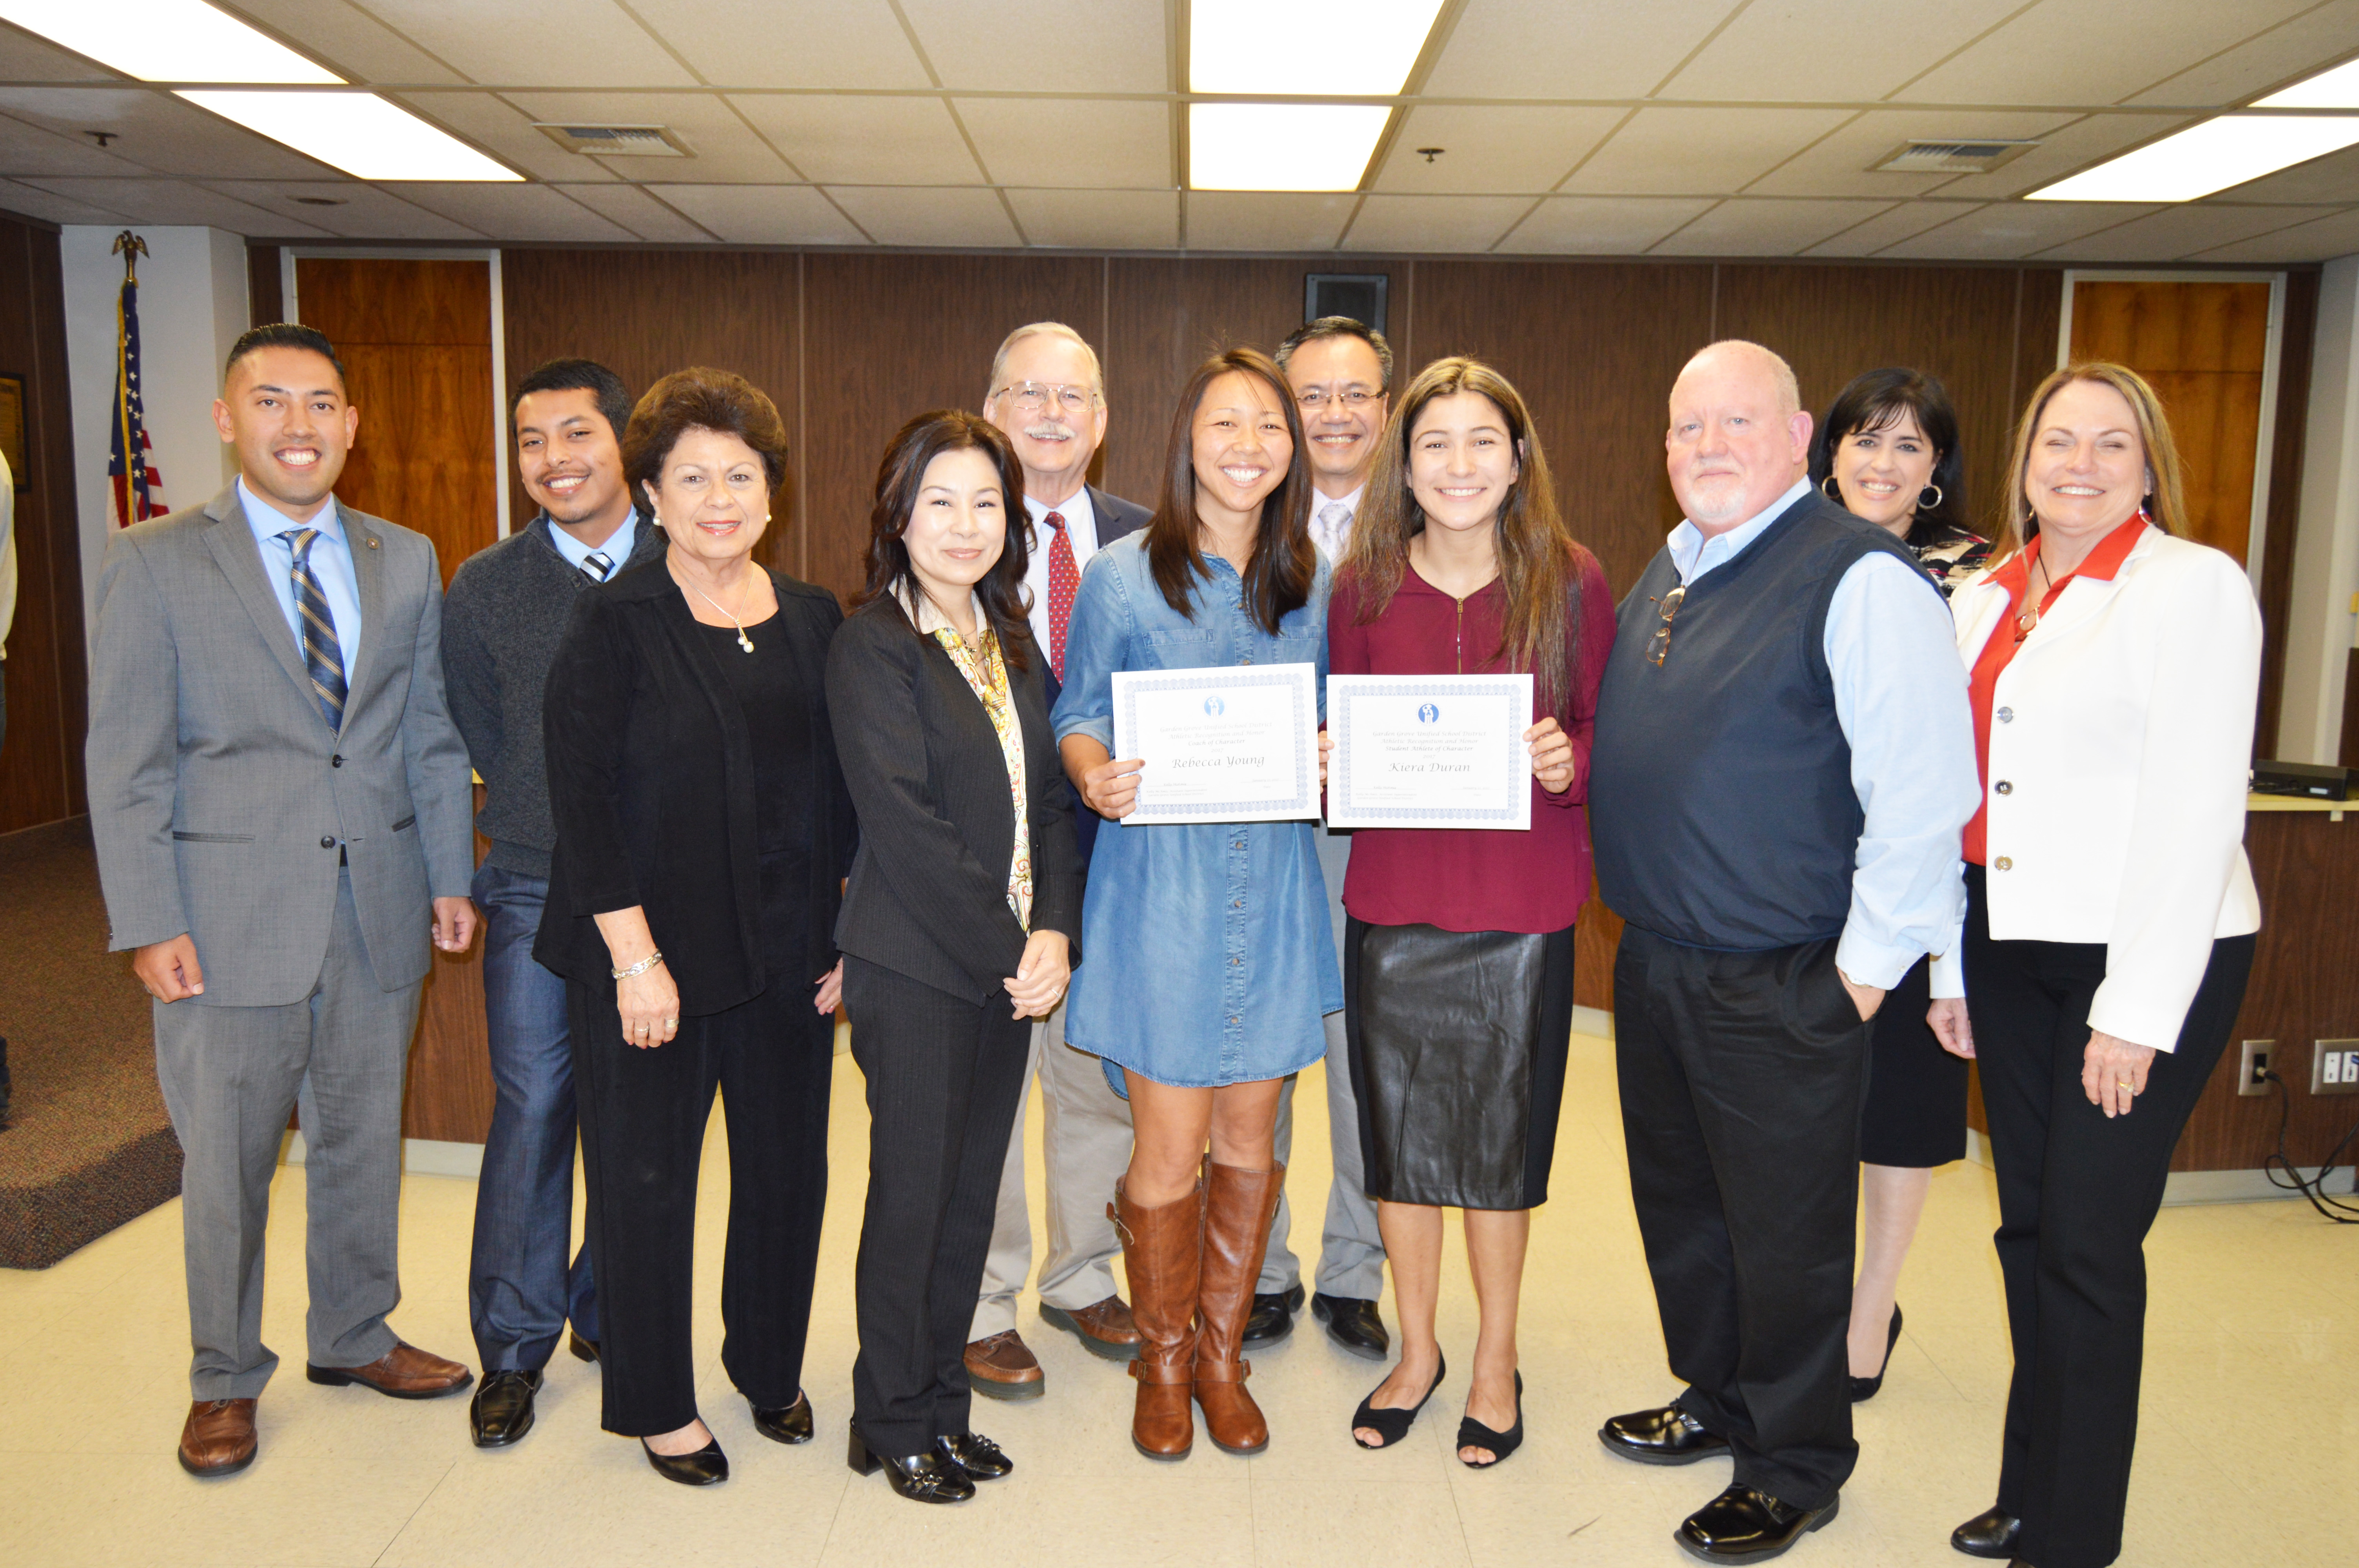 Athletes Coaches Of Character Honored Orange County Tribune